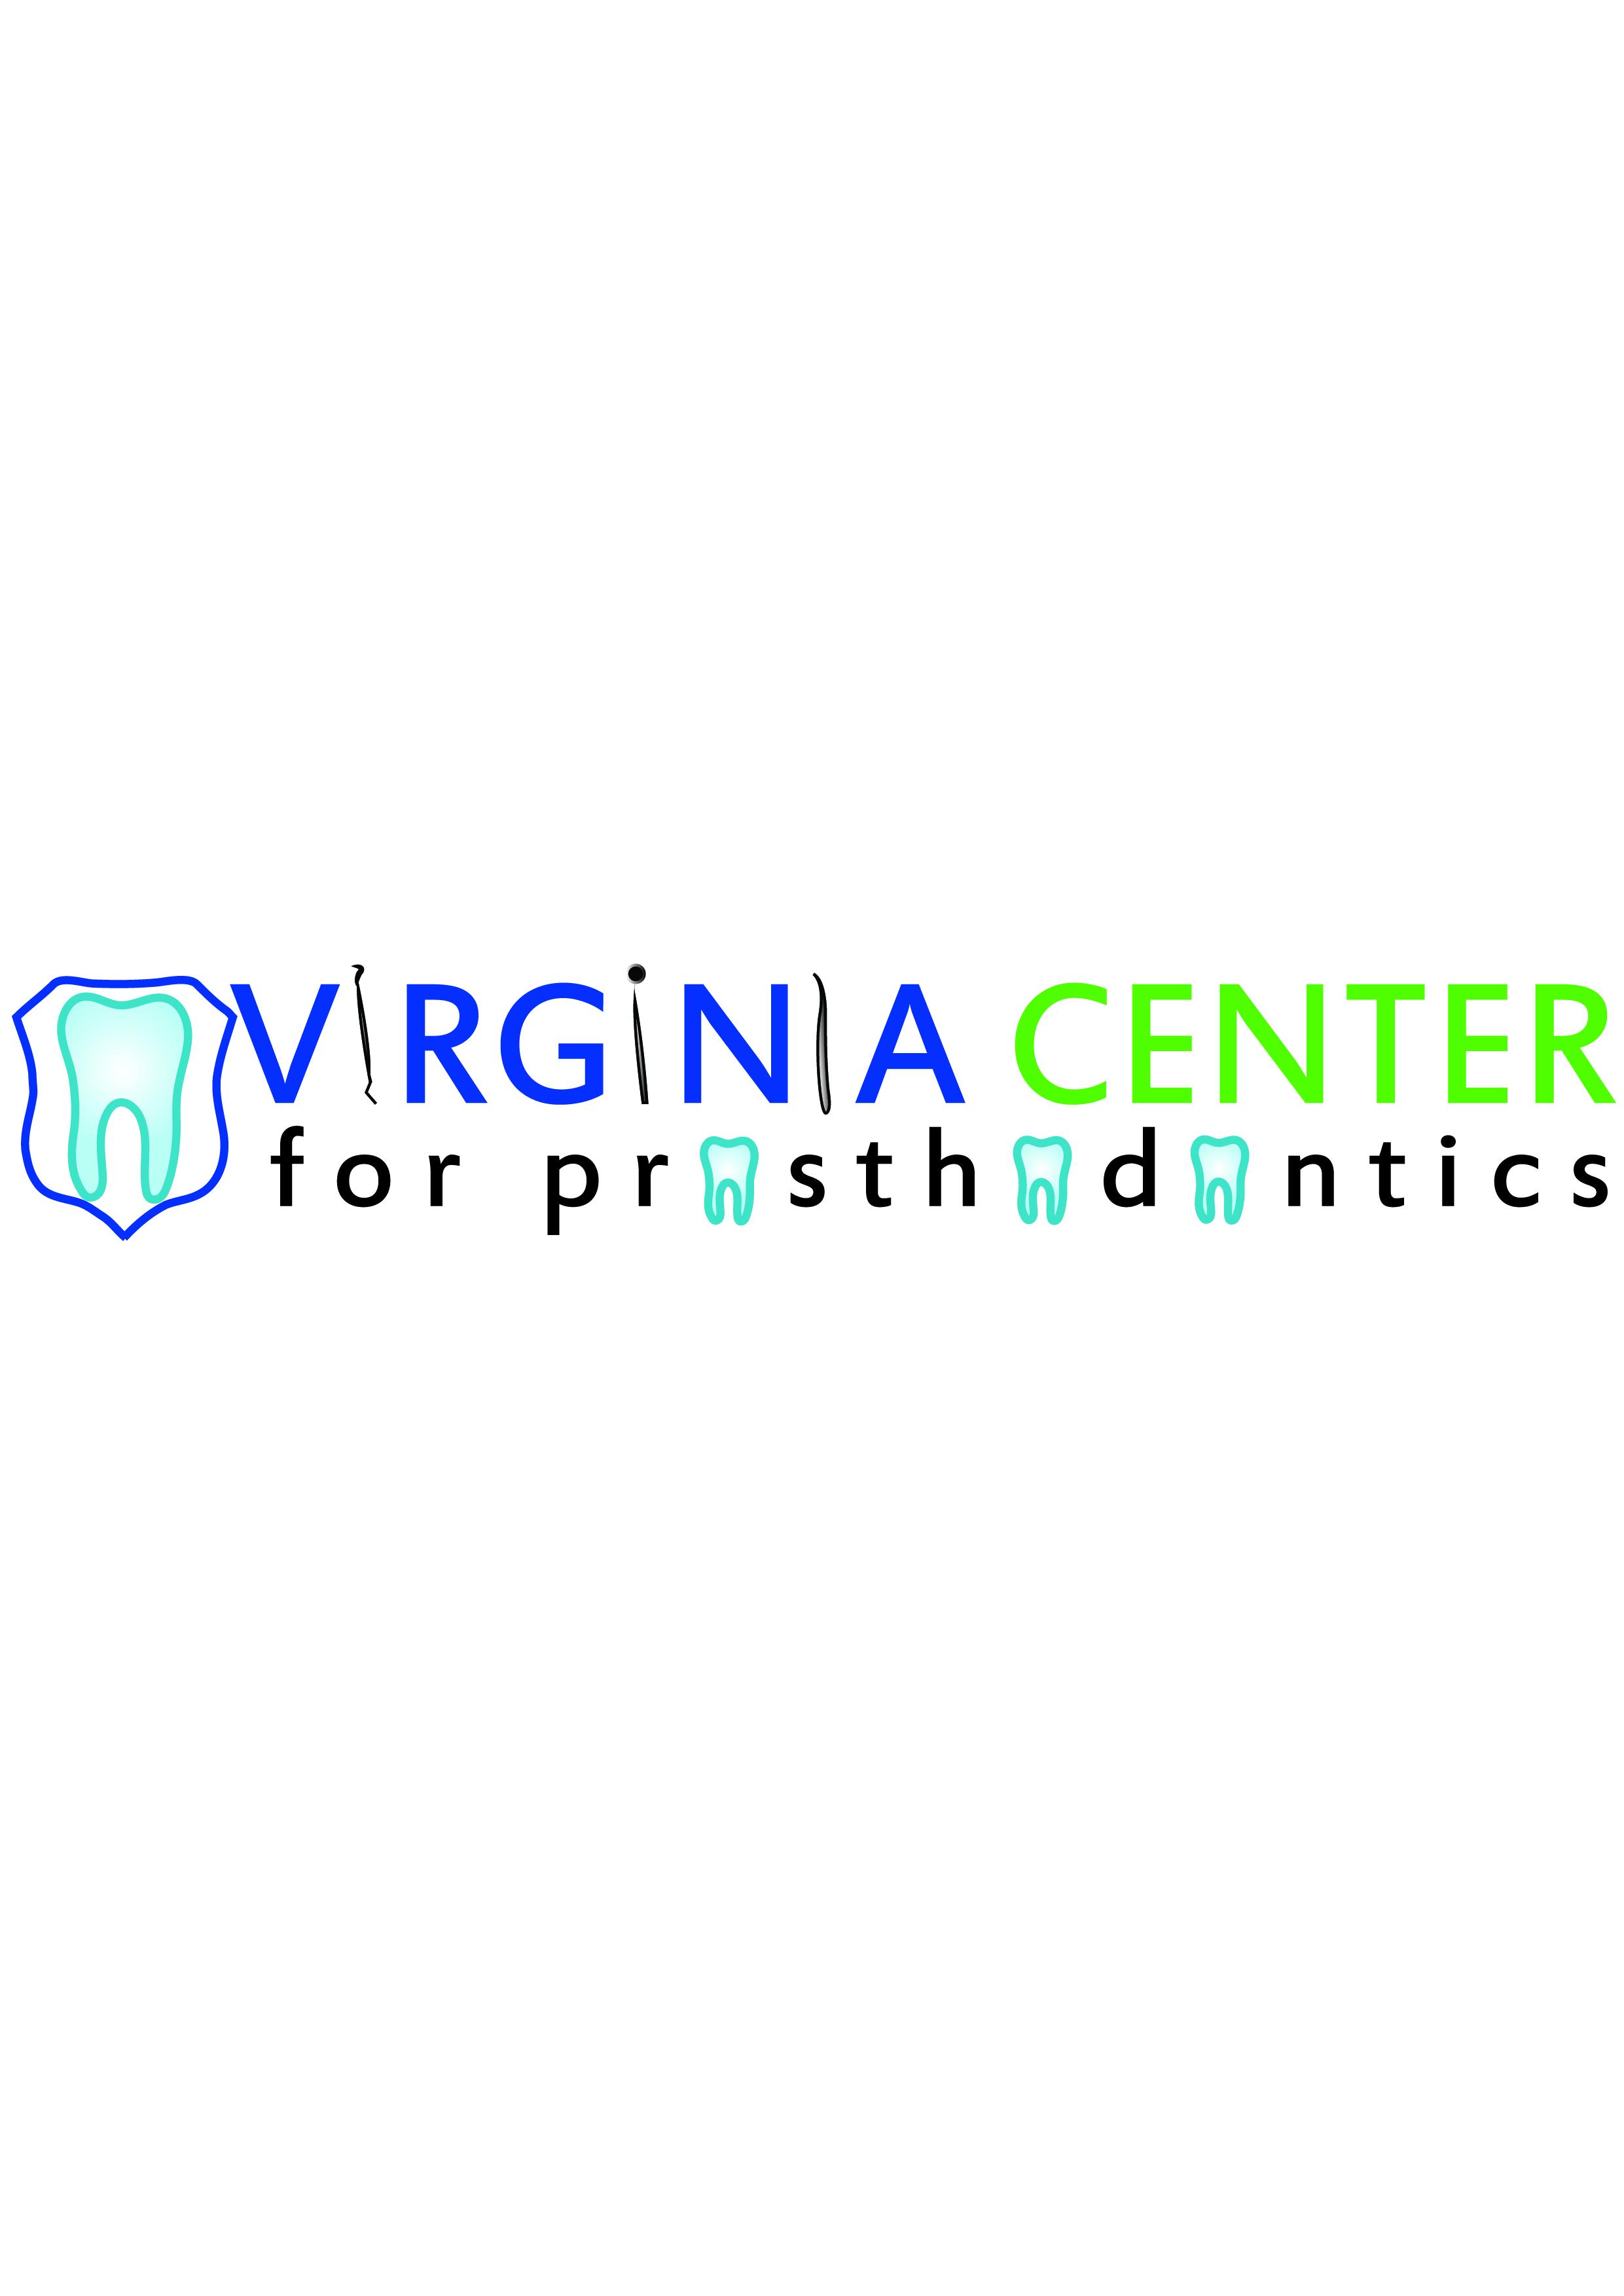 Logo Design by Sara Khanzada - Entry No. 17 in the Logo Design Contest Imaginative Logo Design for Virginia Center for Prosthodontics.